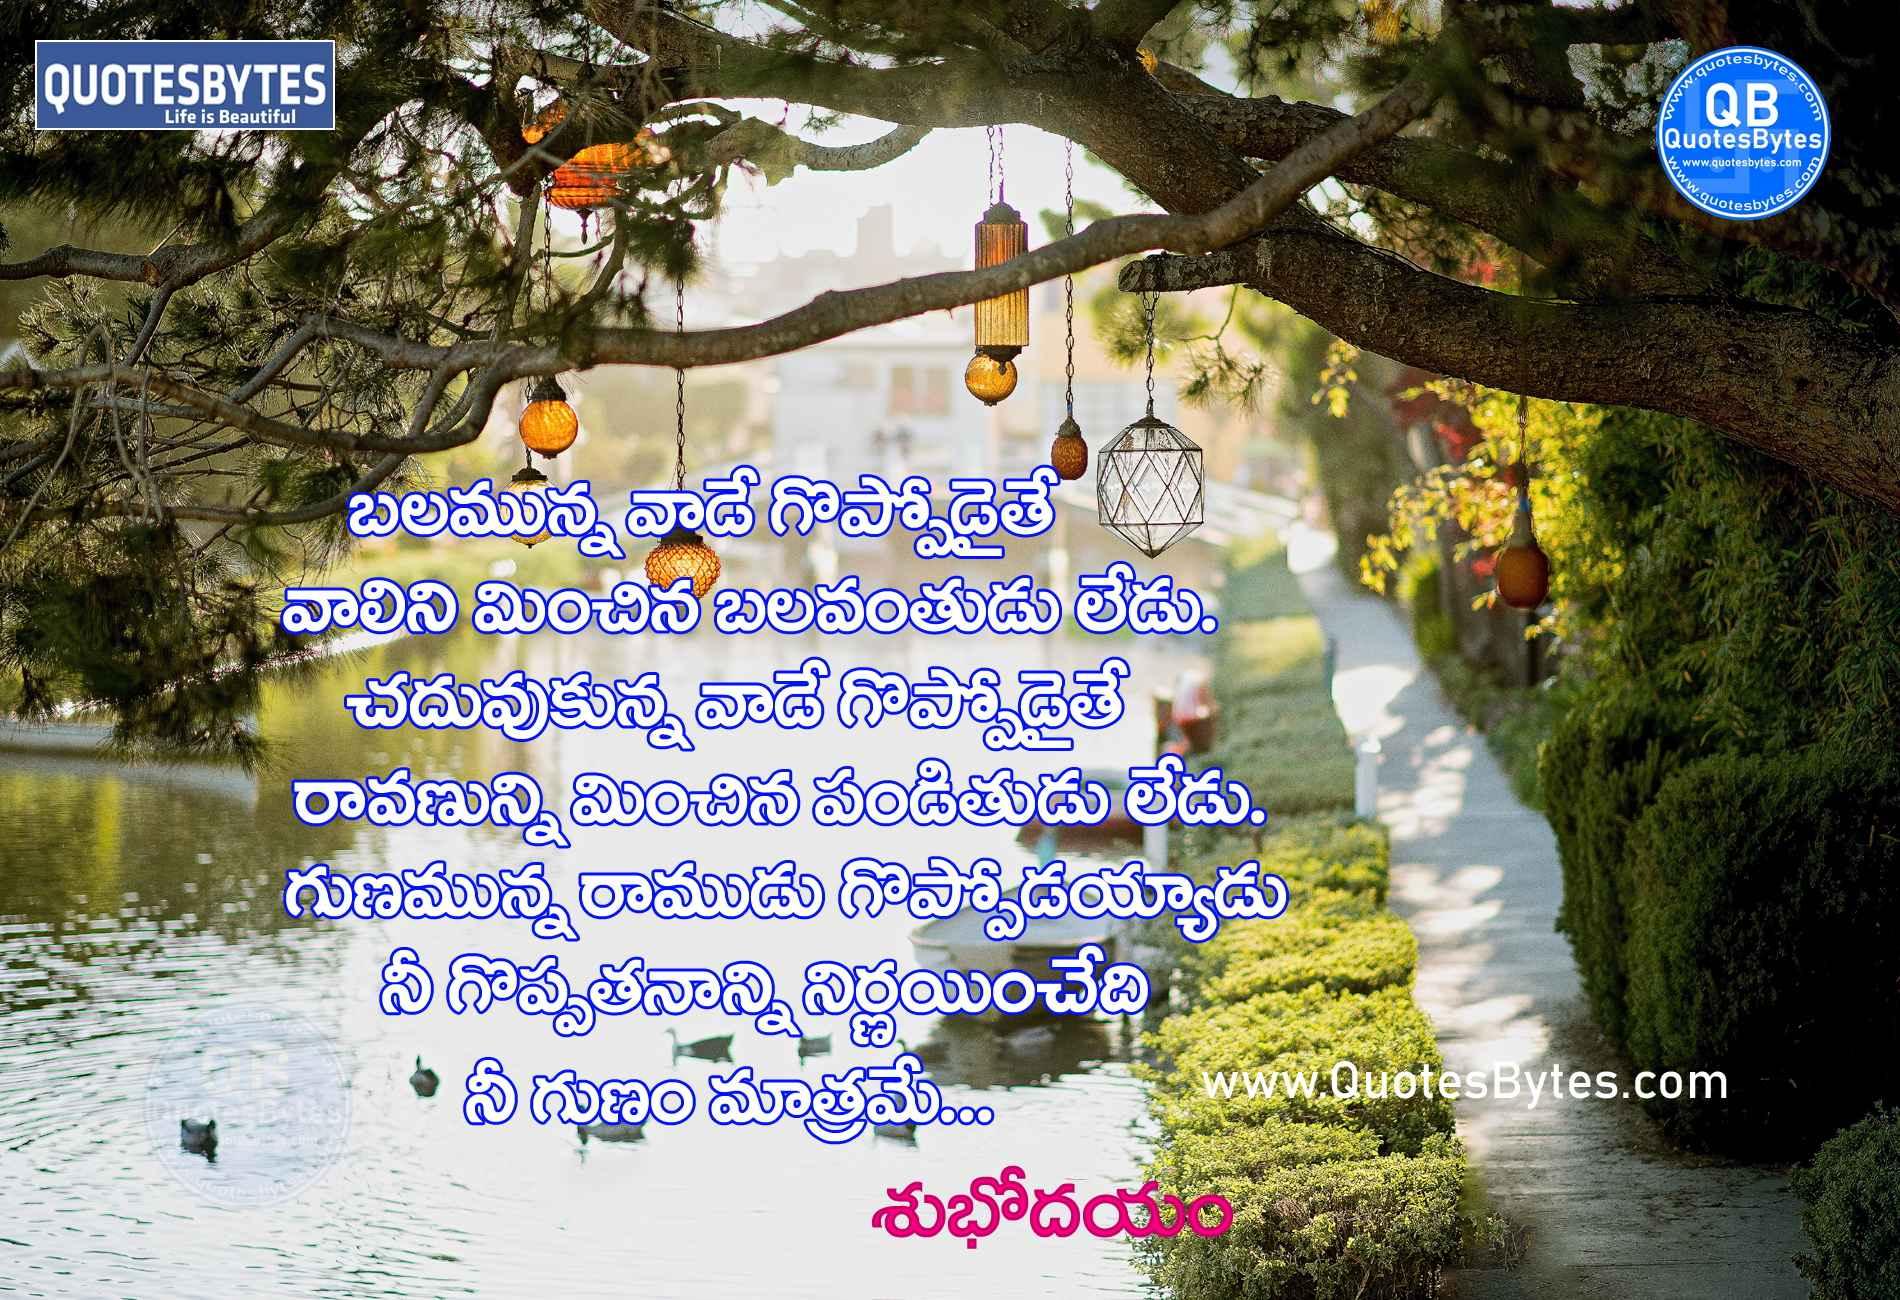 good morning images in telugu-good morning wishes in Telugu